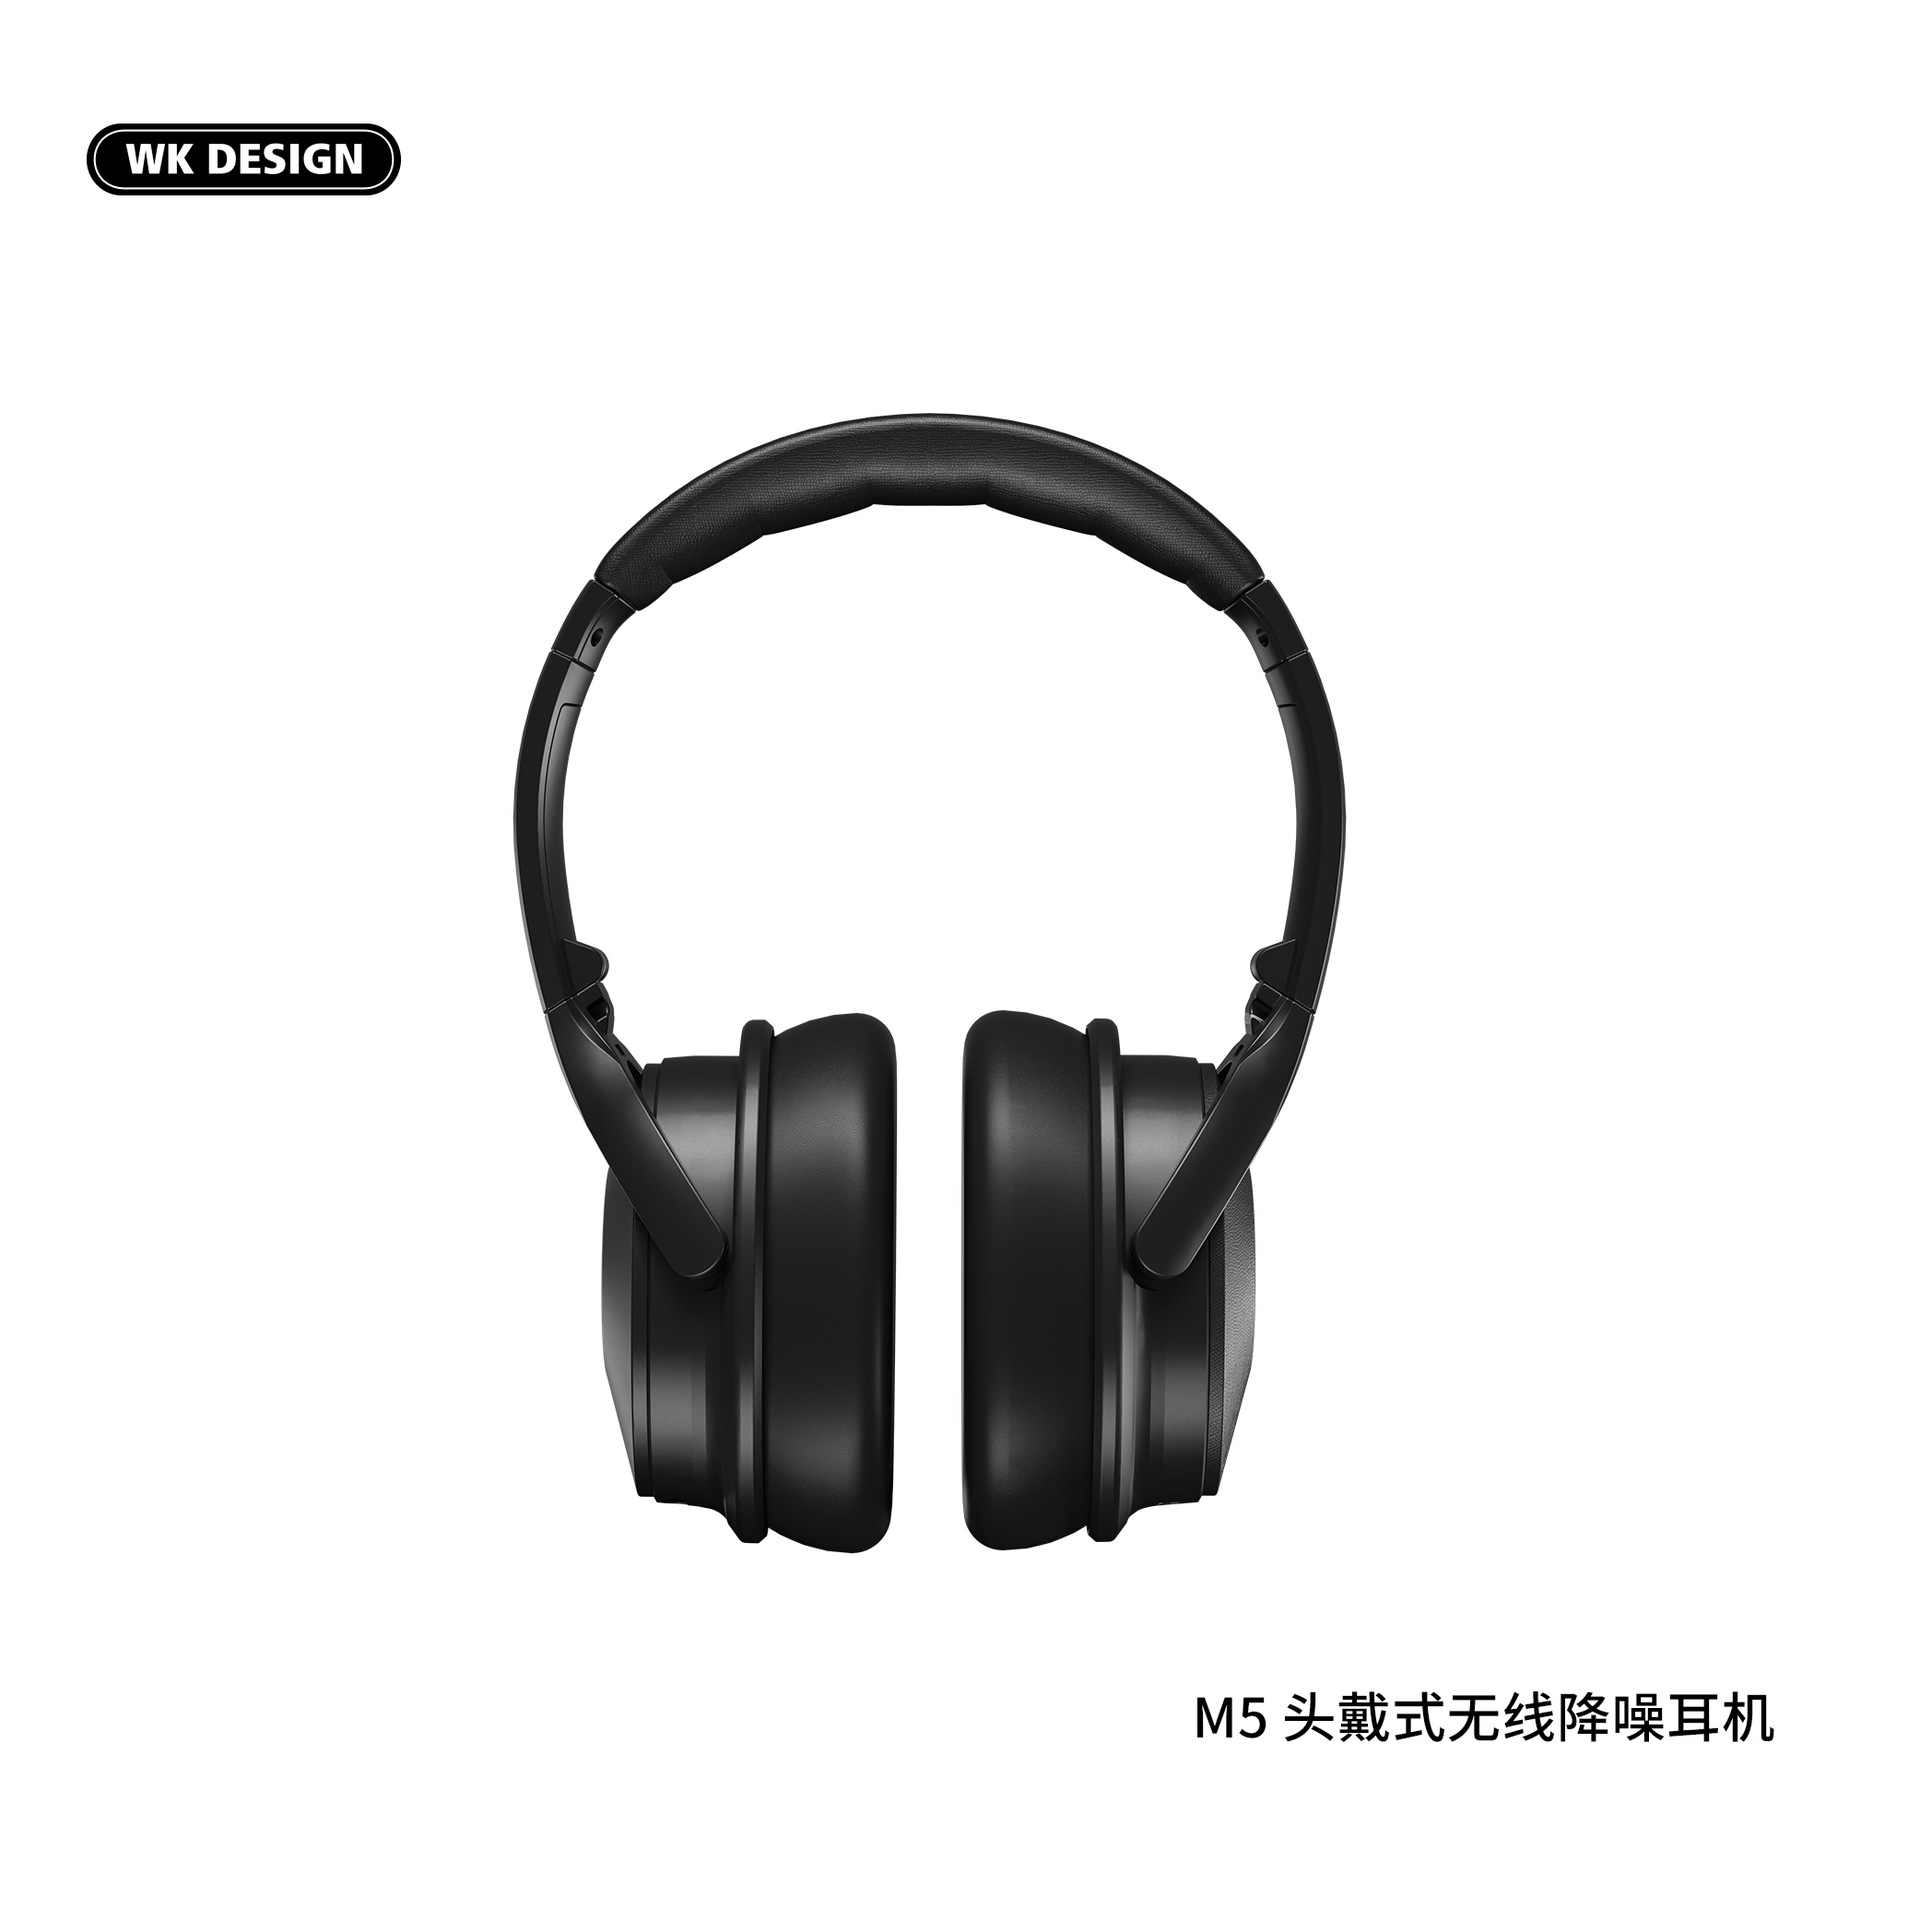 Original Wk Bluetooth Headset 4 1 Mobile Phone Universal Wireless Commercial Phone M5 Aliexpress